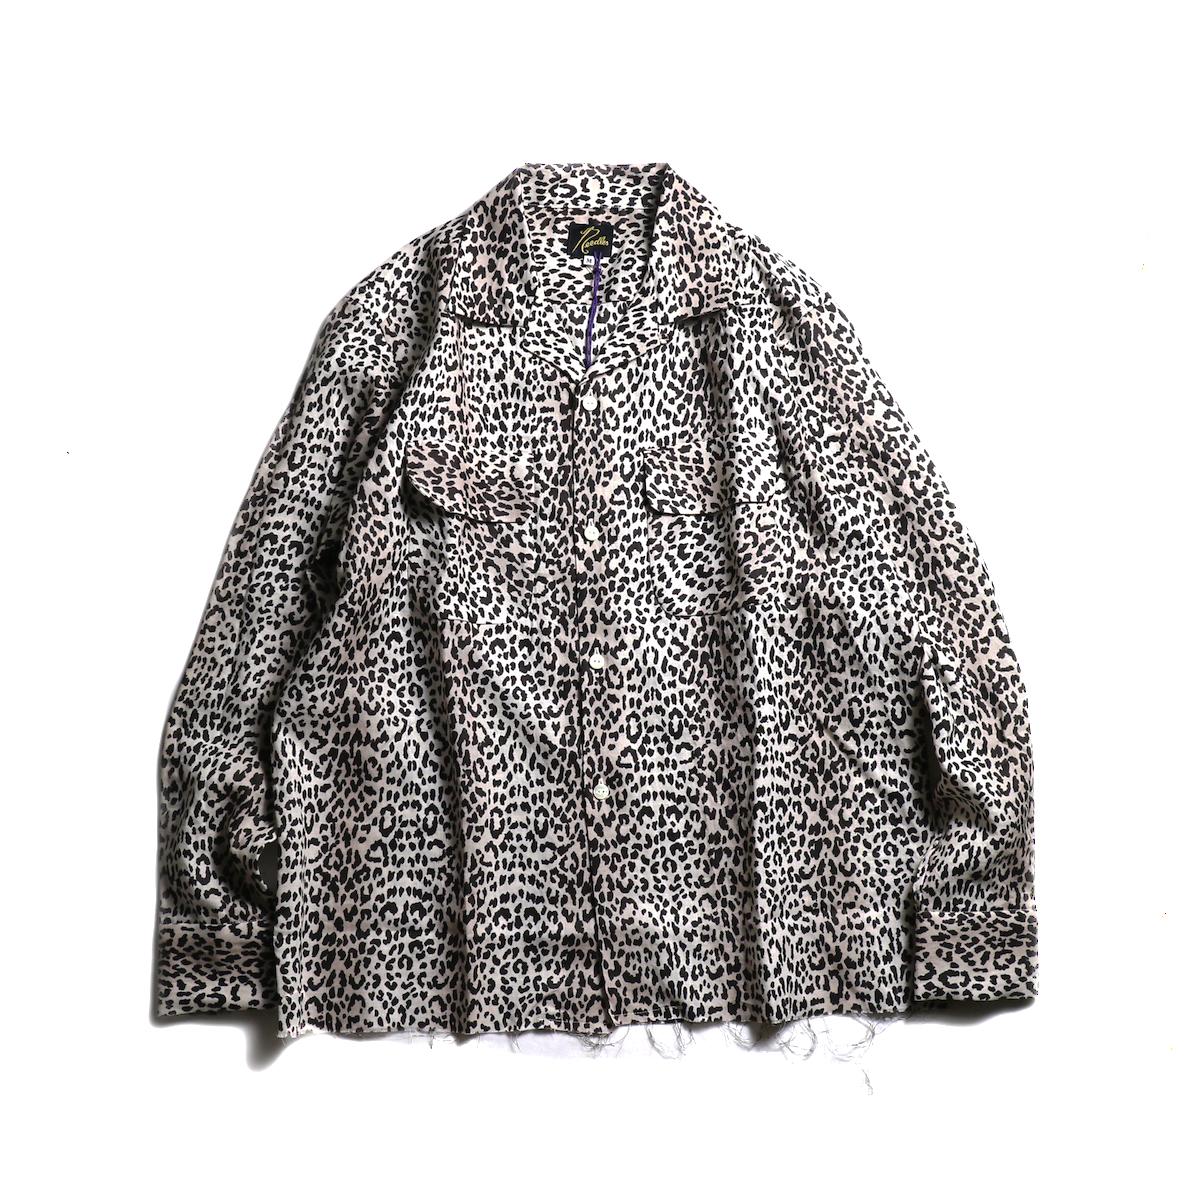 NEEDLES / Cut-Off Bottom Classic Shirt -Linen Cloth / Leopard Print (Off White)